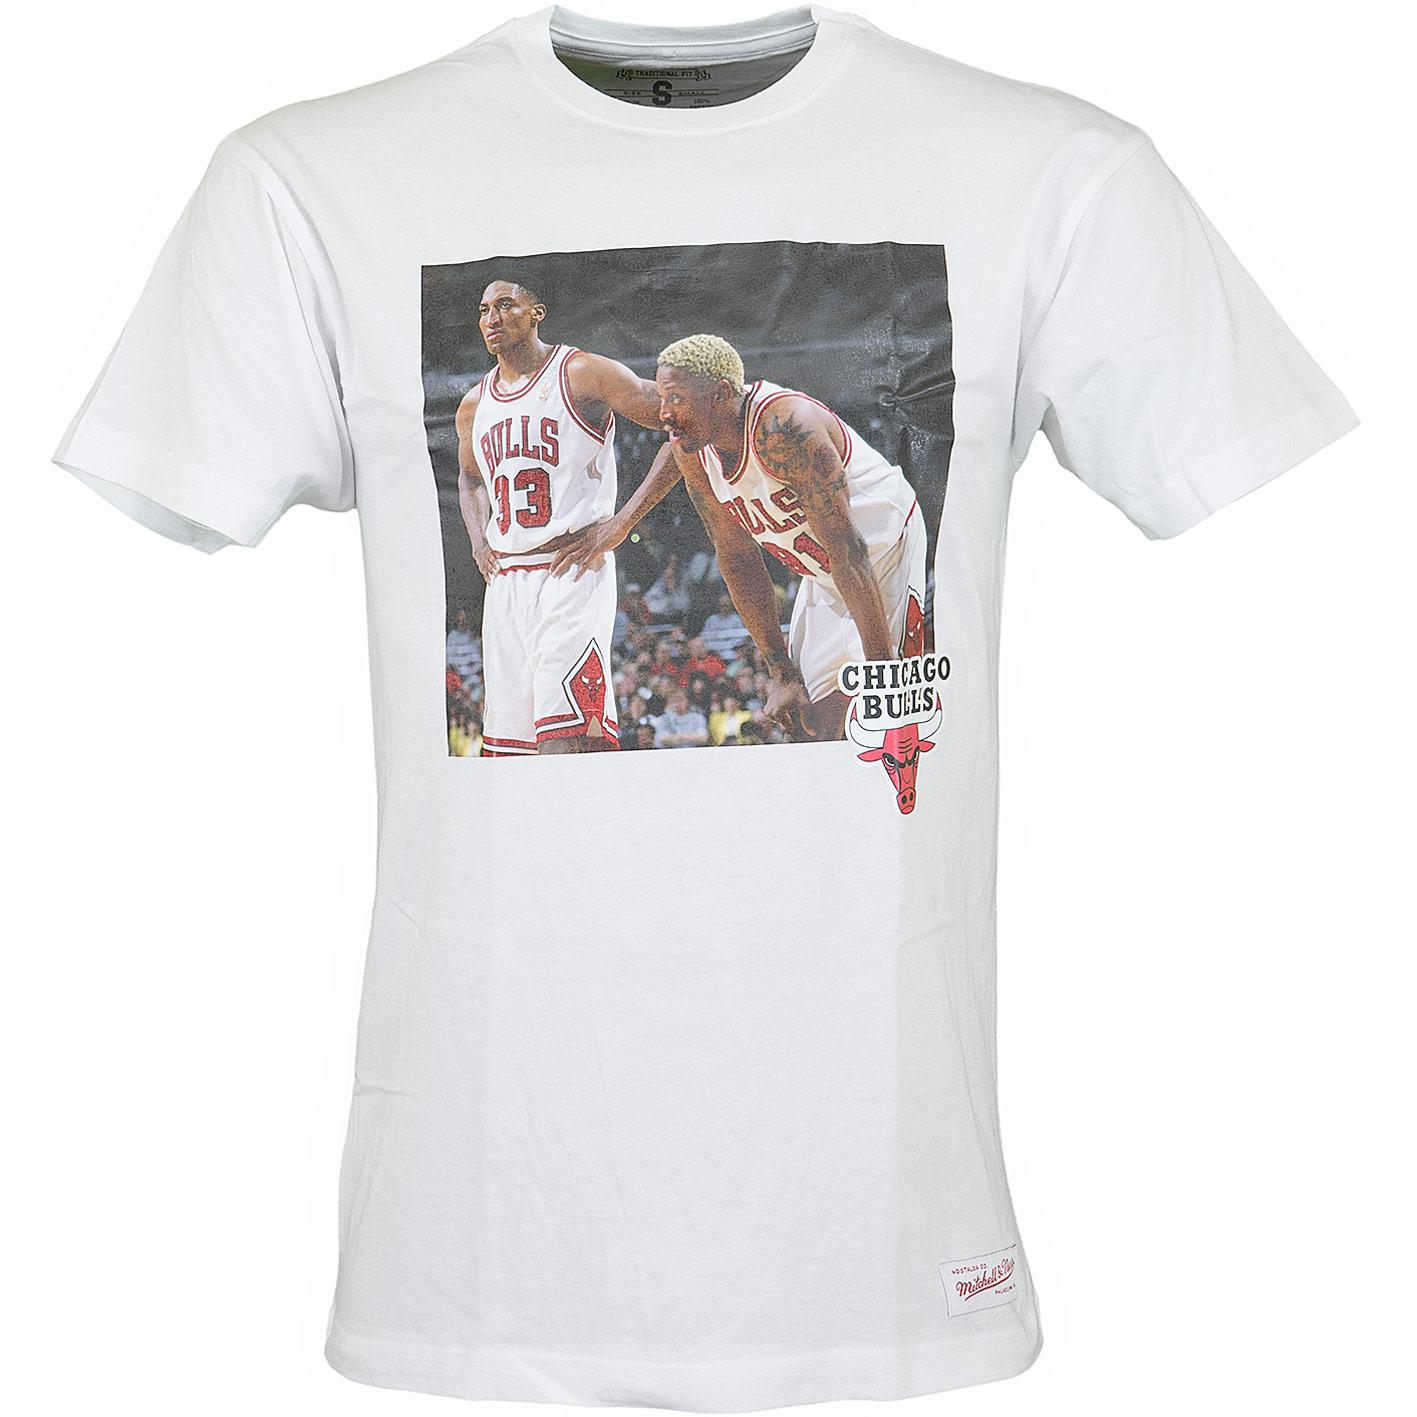 buy online 60060 94f15 Mitchell & Ness T-Shirt Chicago Bulls Pippen & Rodman weiß